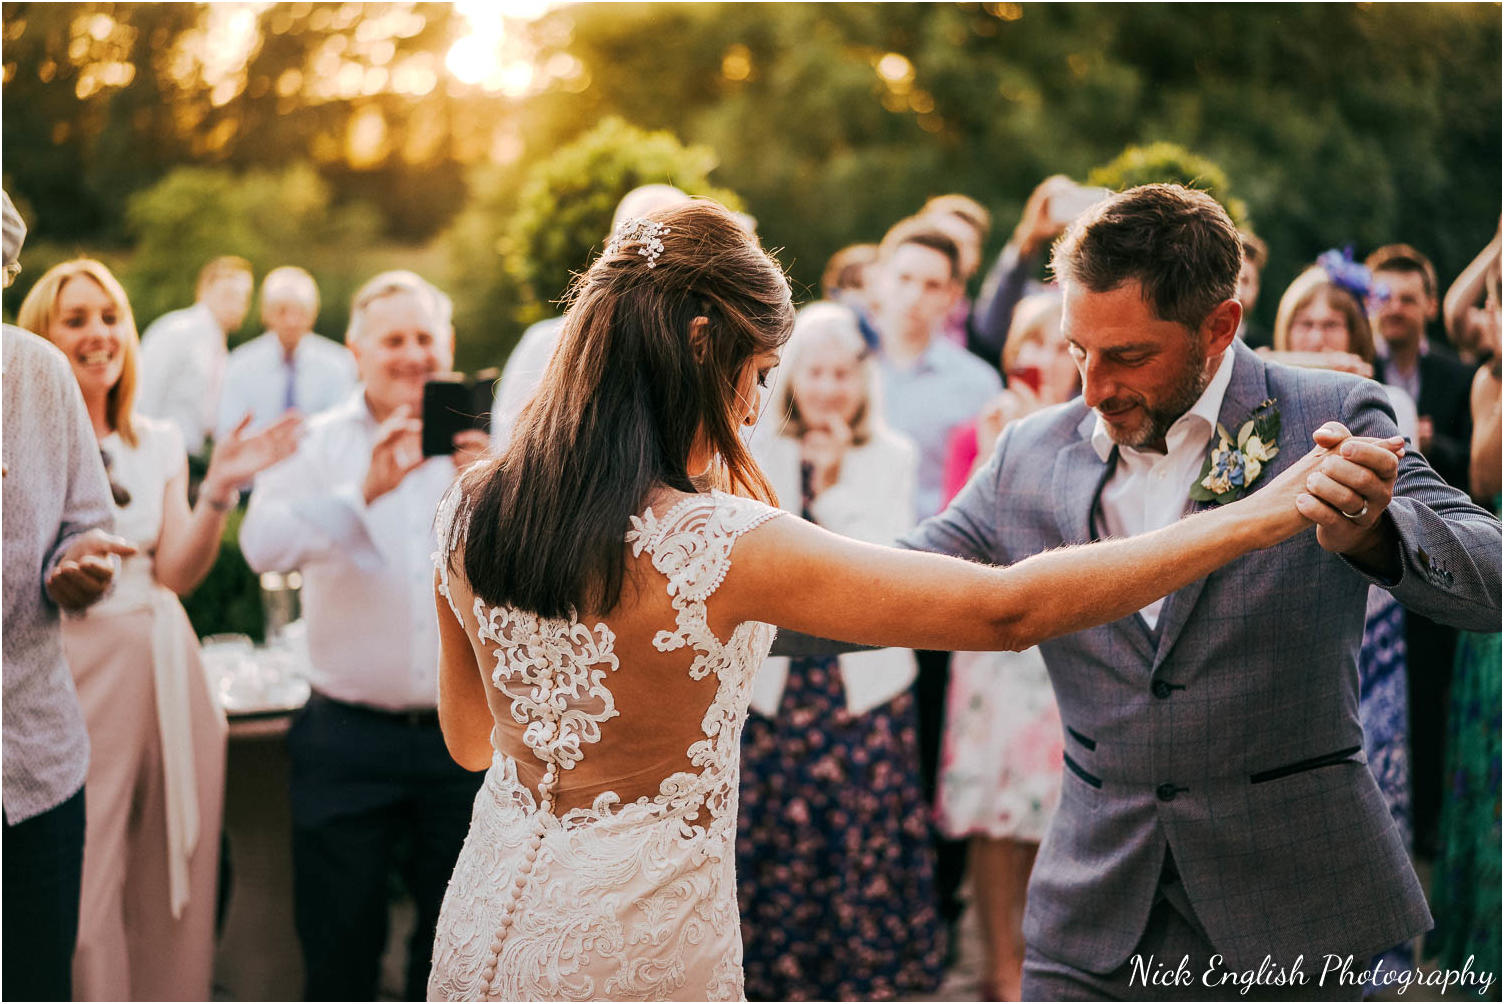 Mitton_Hall_Wedding_Photographer-110.jpg